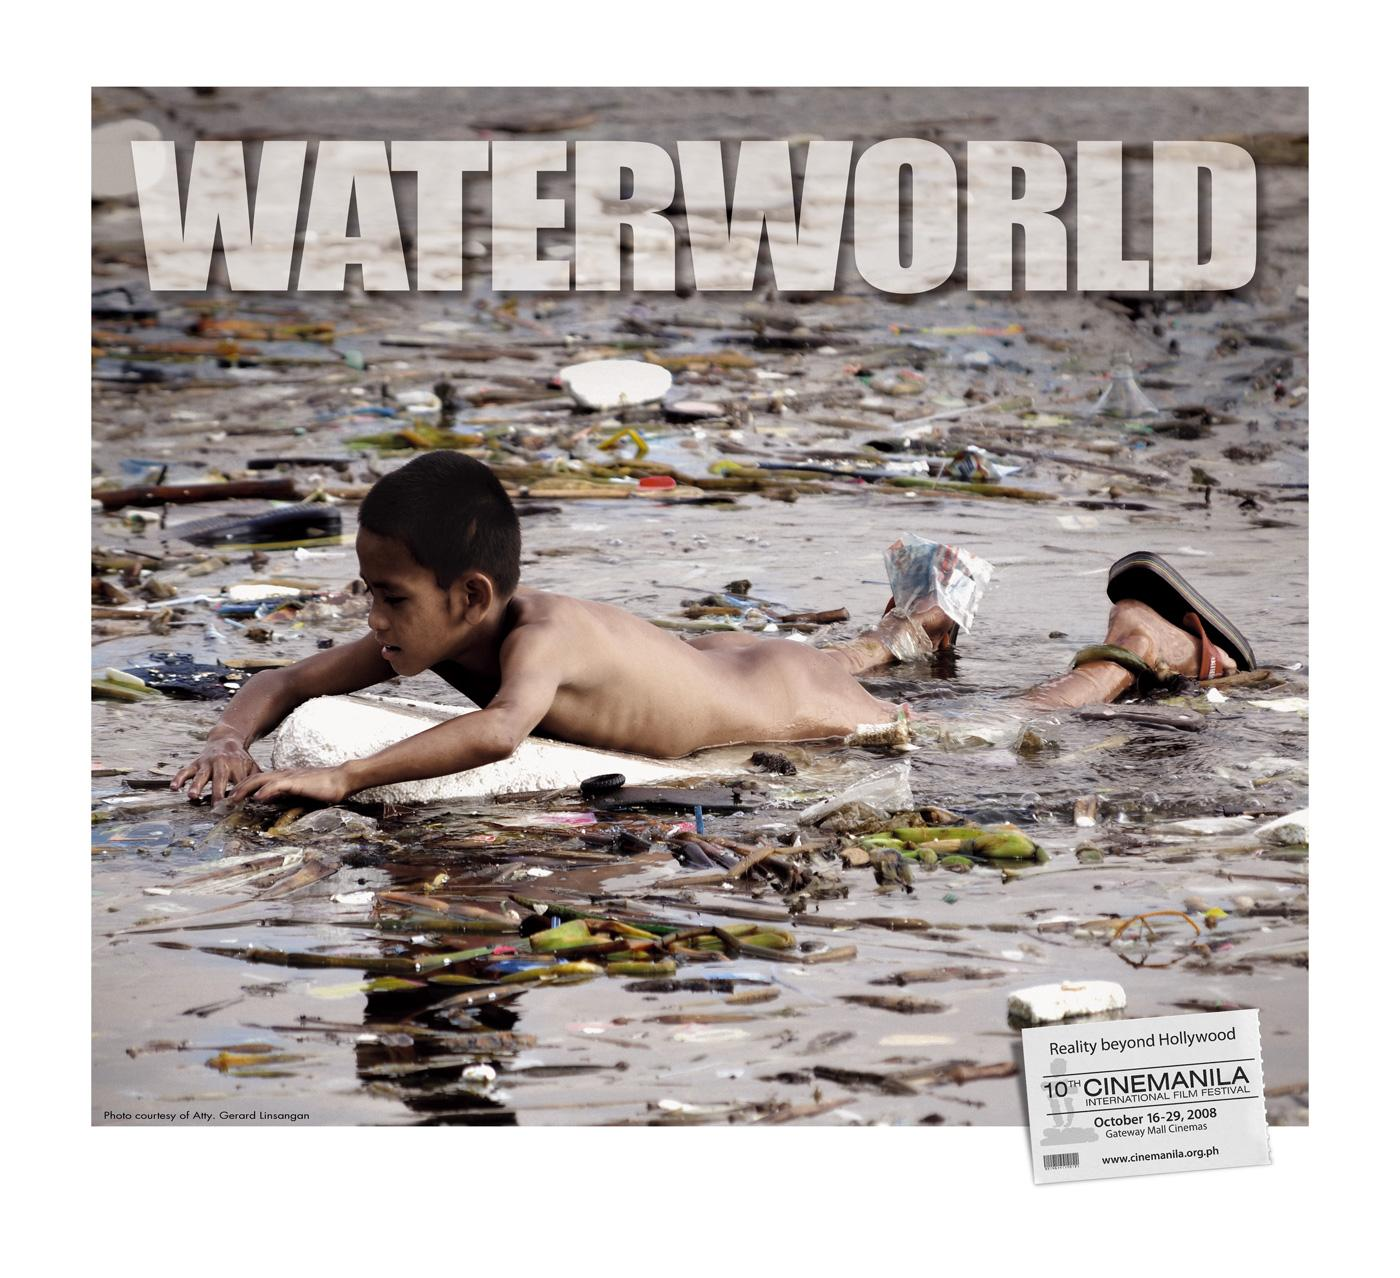 Cinemanila Print Ad -  Waterworld